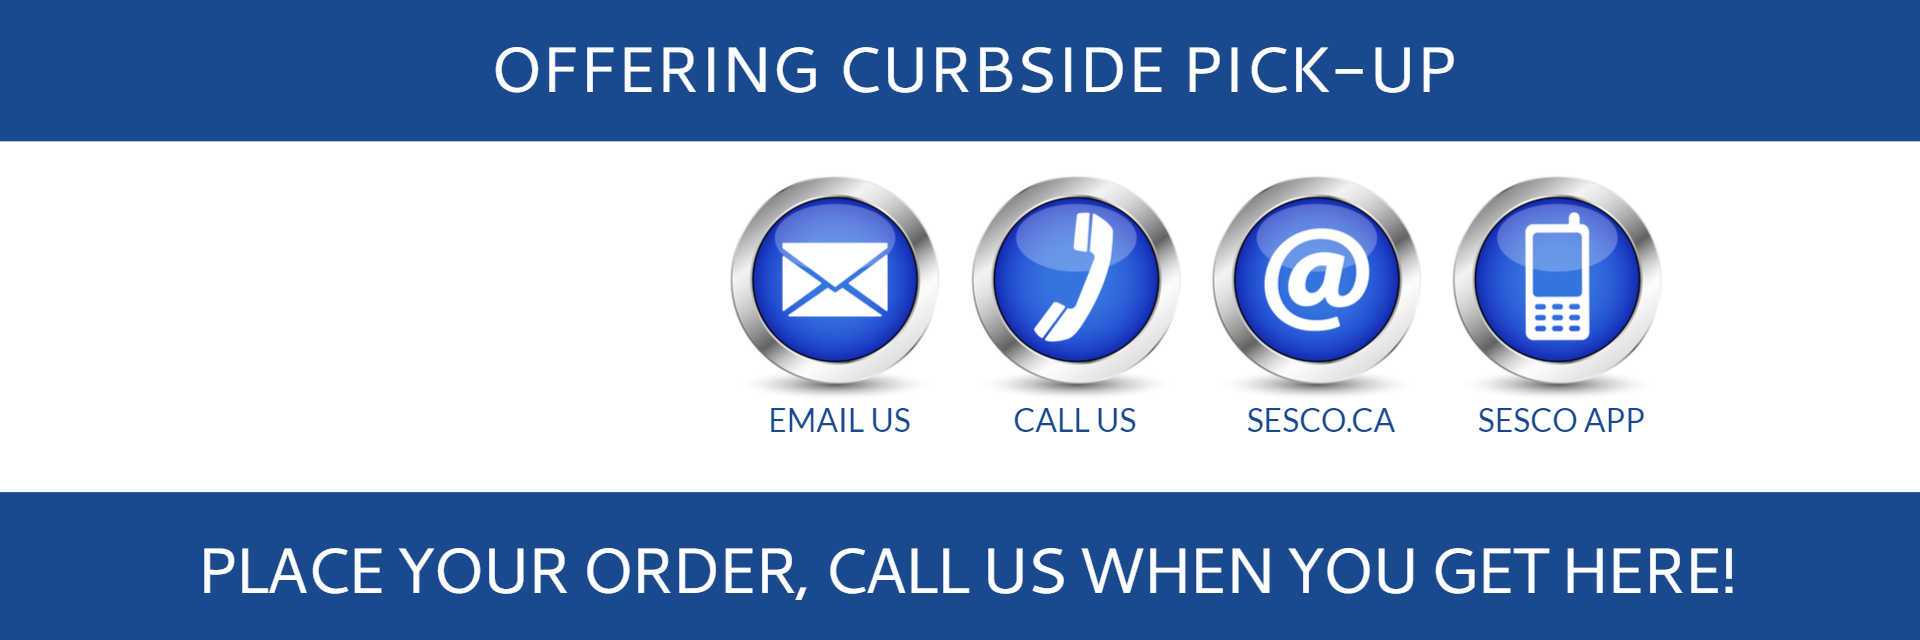 4 Ways to Order